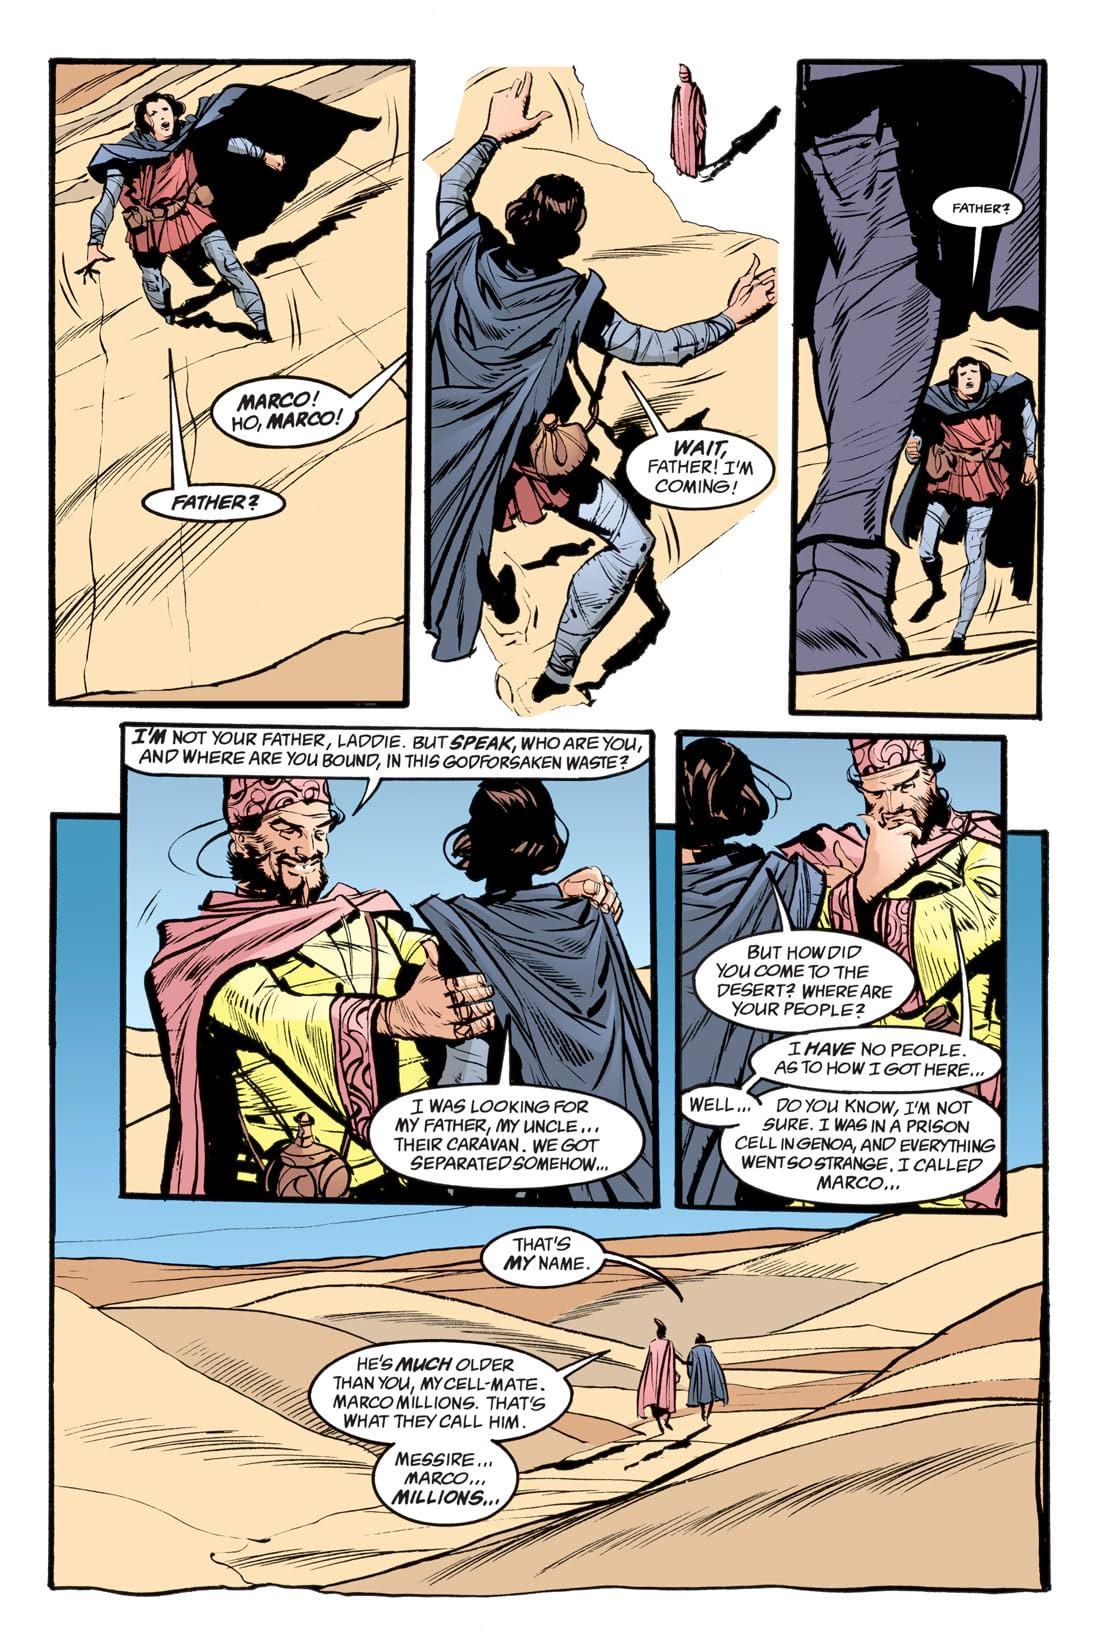 The Sandman #39